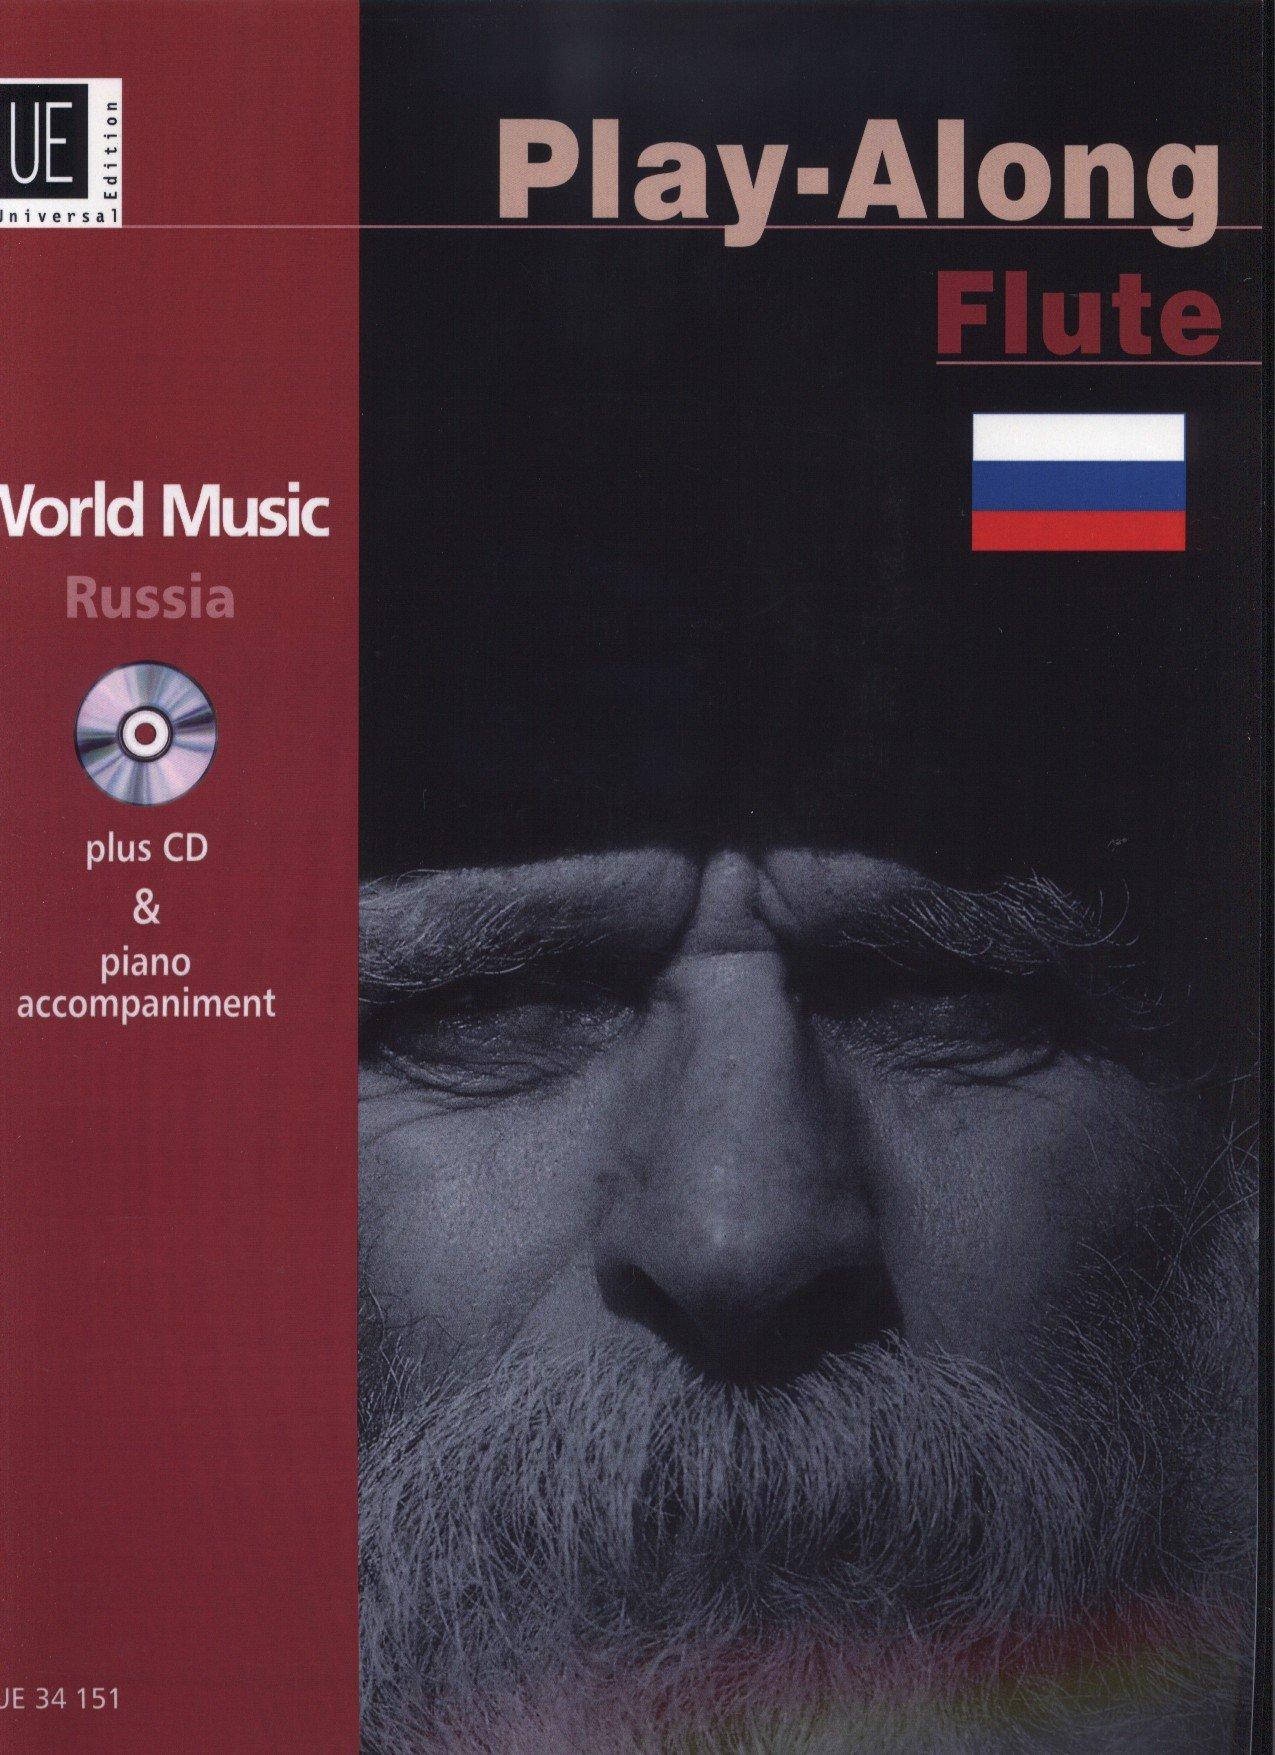 Download World Music Russia: Piano Part Plus Flute Part: Play-along Flute PDF